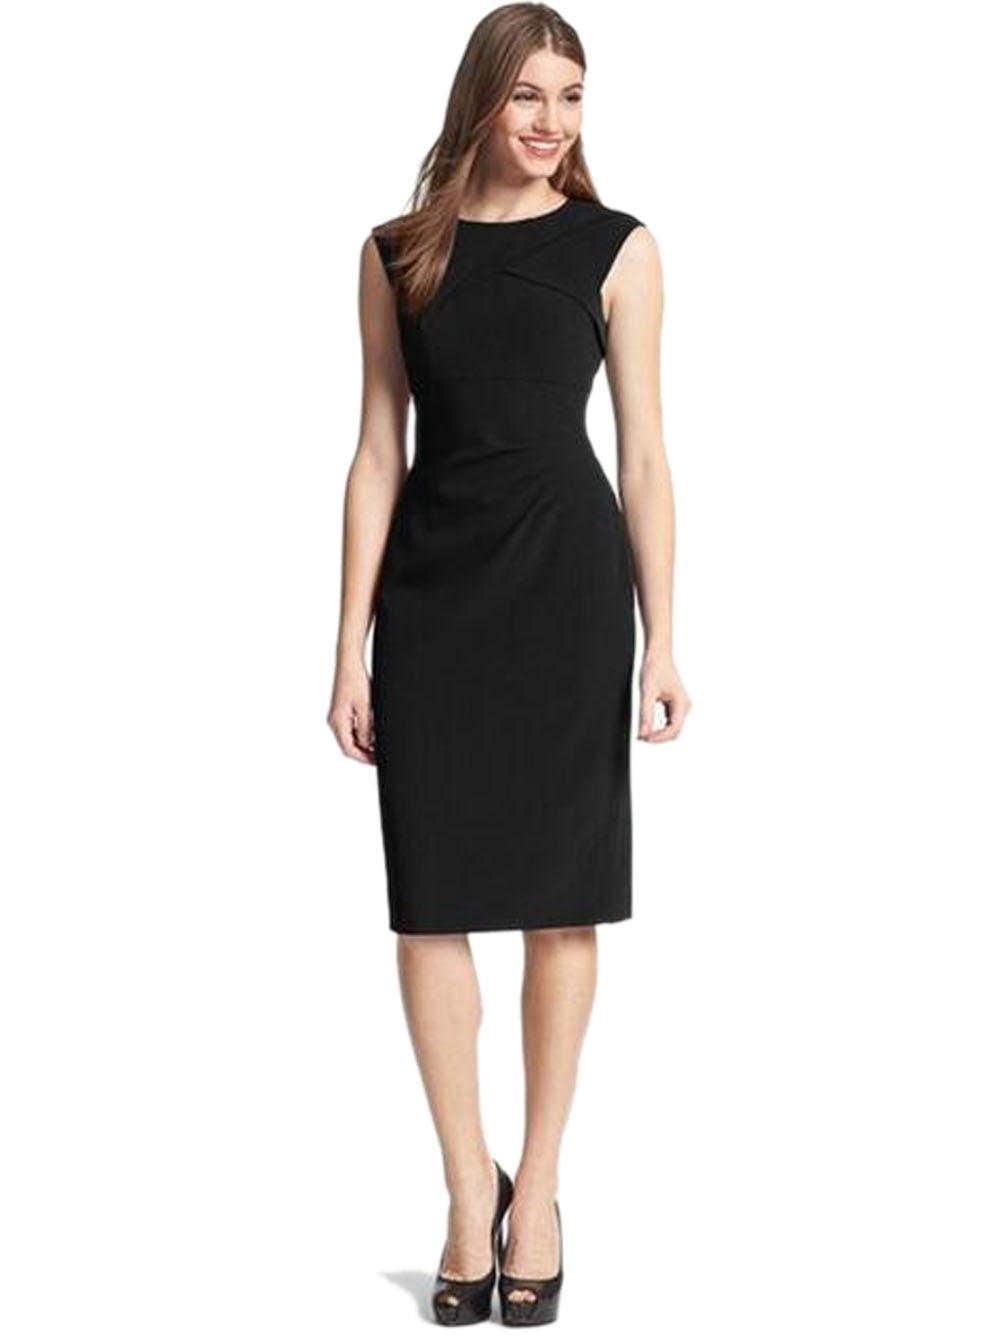 Black dress office - Crepe Dress Ruched Bodycon Elegant Work Office Dress Petite Casual Simple Sleeveless Little Black Dress Classy